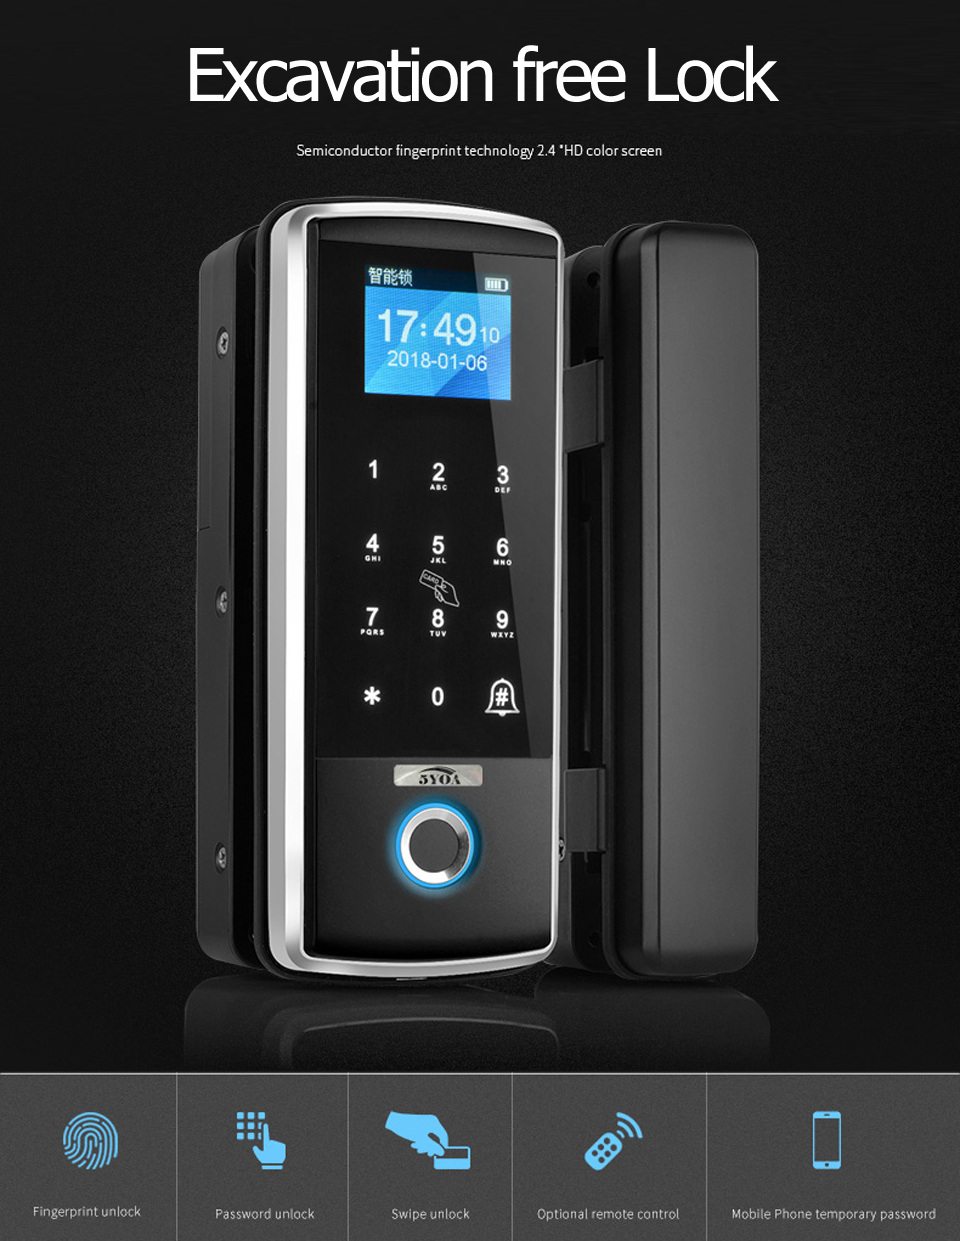 HTB129ehdWSs3KVjSZPiq6AsiVXa4 Smart Door Fingerprint Lock Electronic Digital Gate Opener Electric RFID Biometric finger print security Glass Password Card